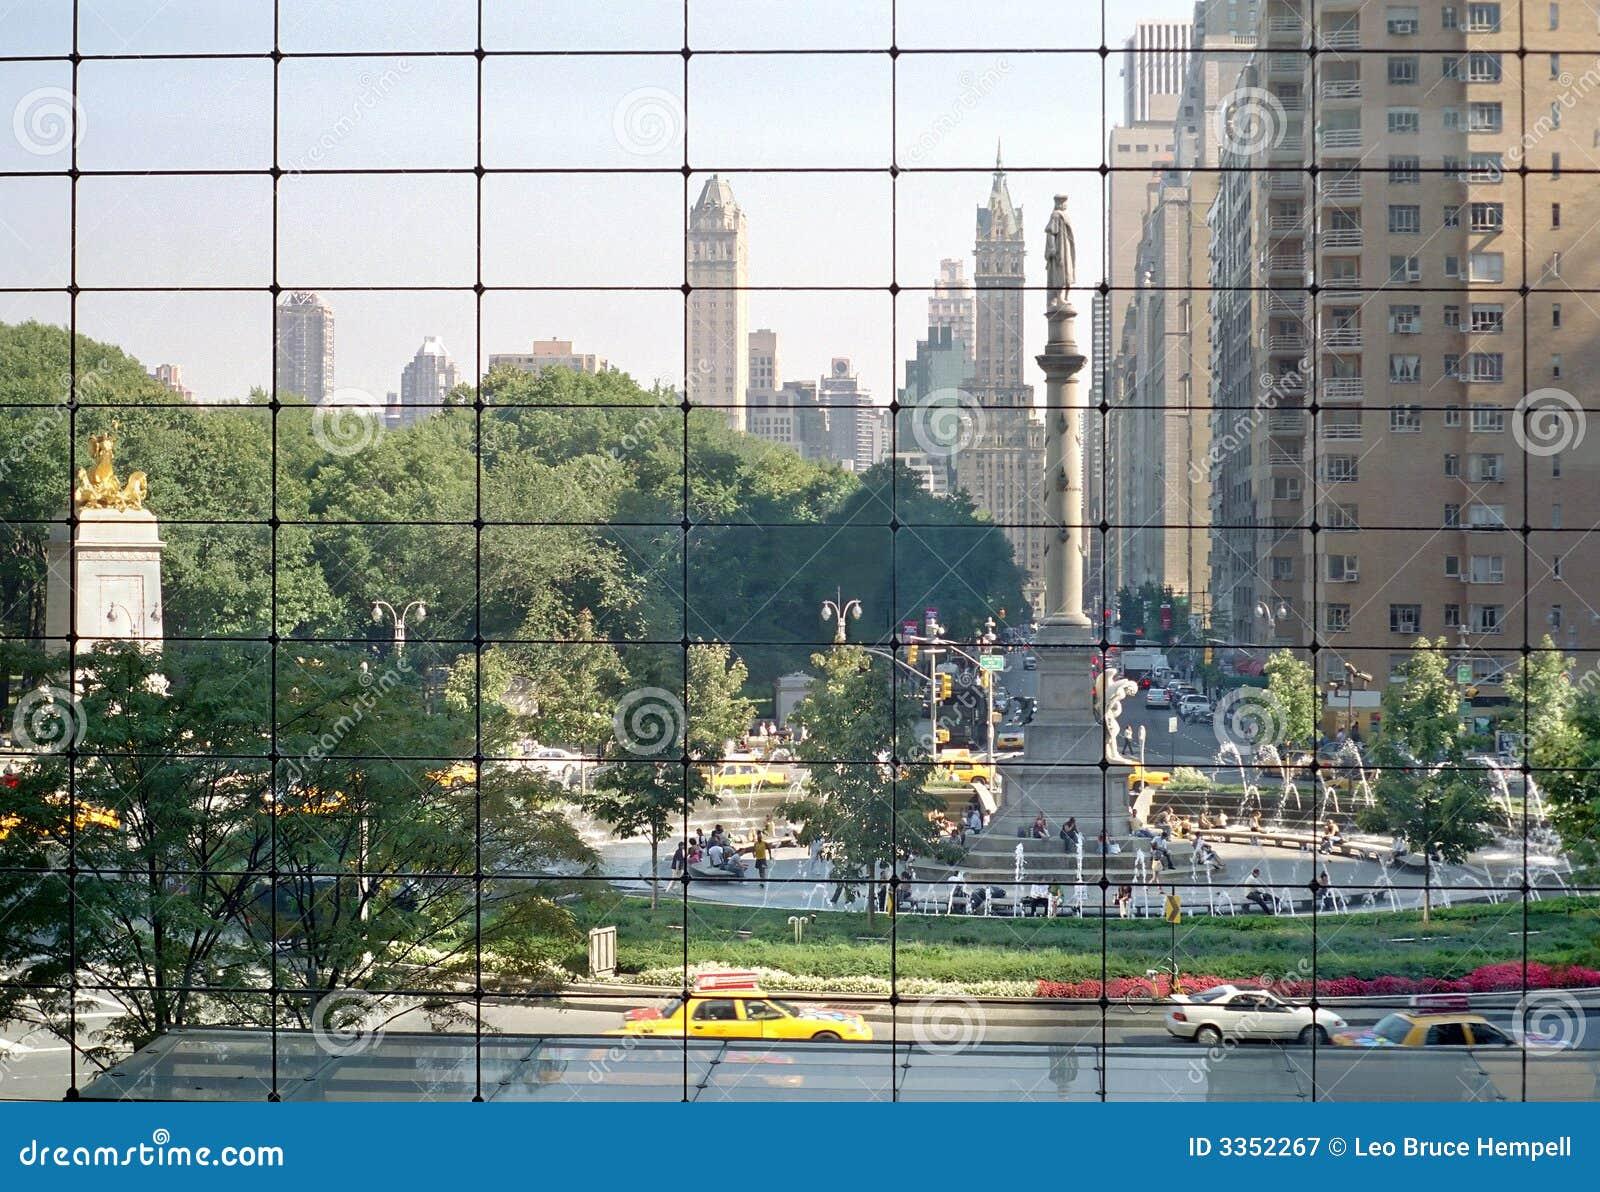 Columbus Circle, Manhattan. New York